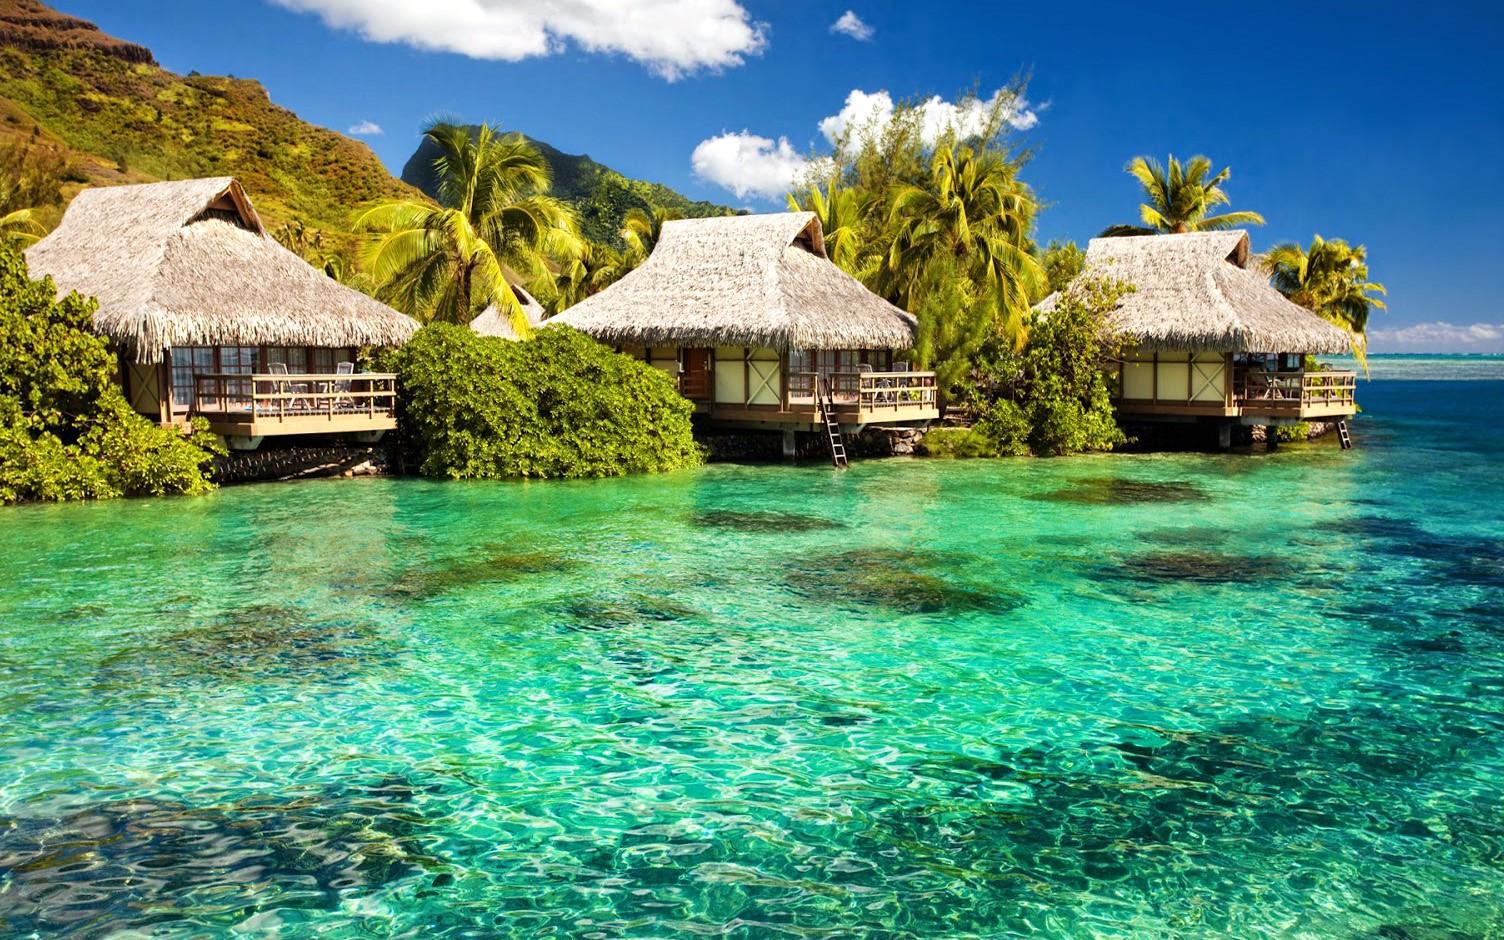 Beautiful Beach House Wallpapers Florida Beach Huts Desktop 1504x940